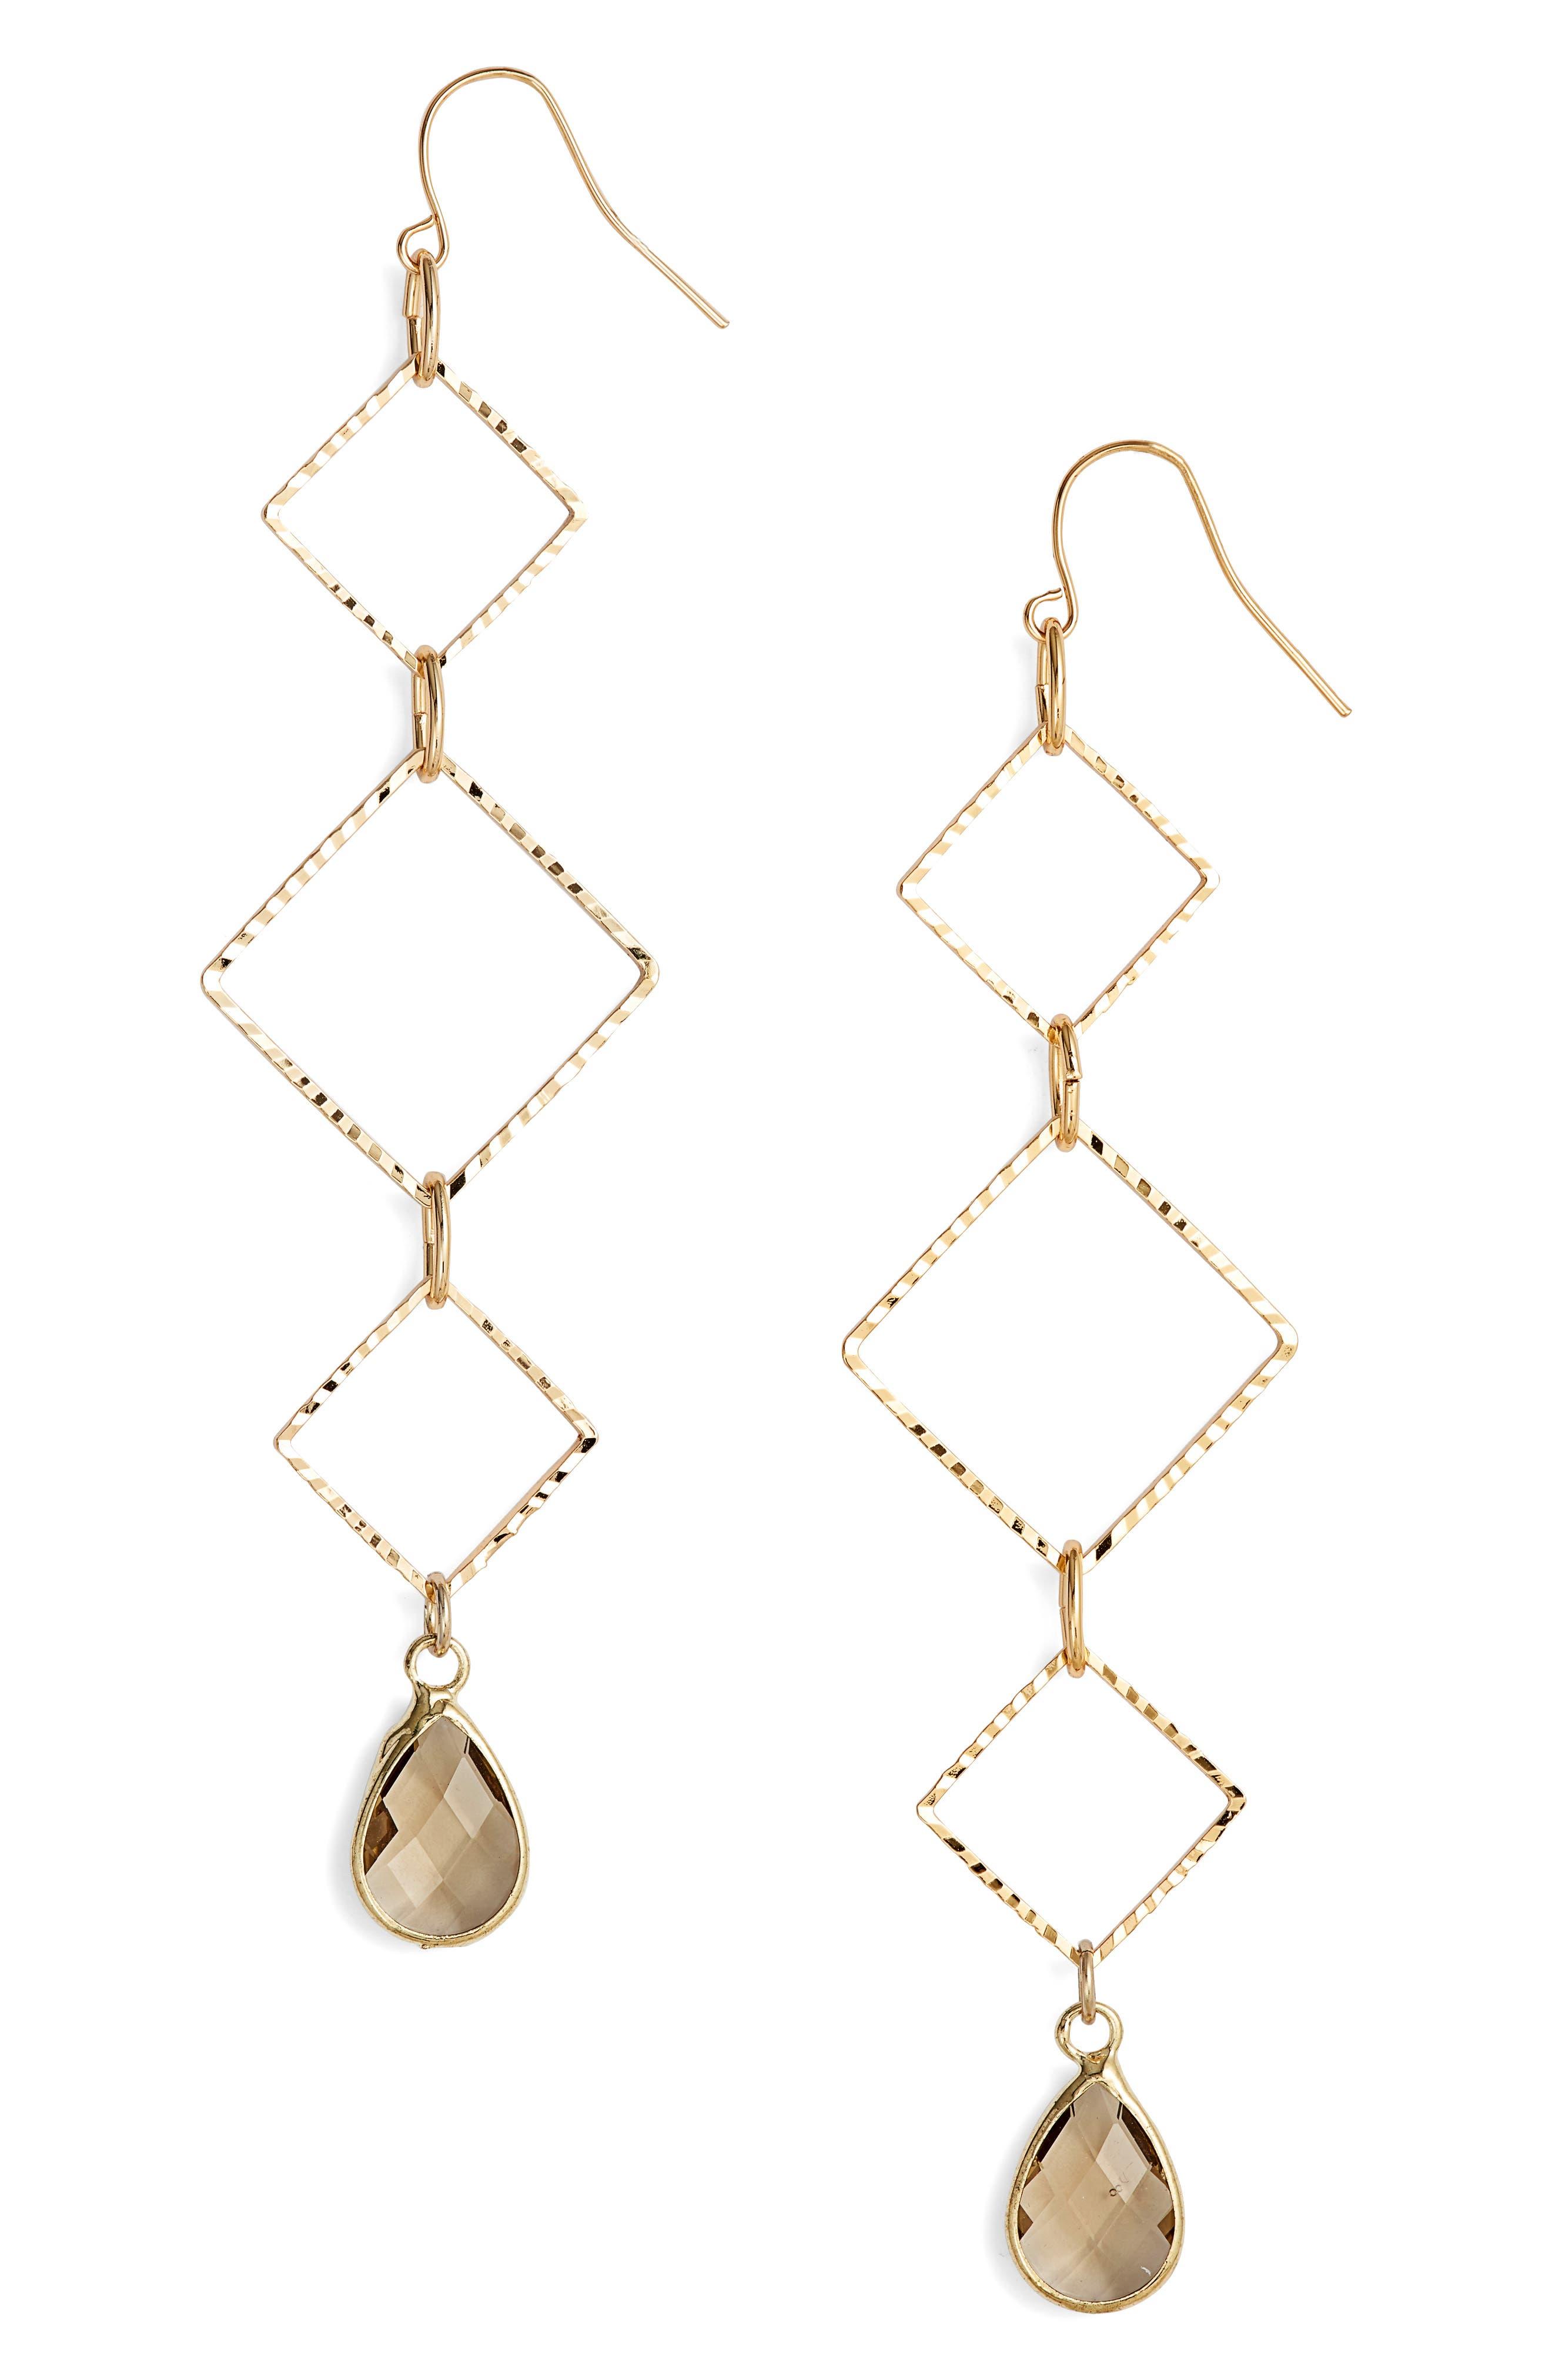 ELISE M. Callie Triangle Drop Earrings in Gold/ Grey